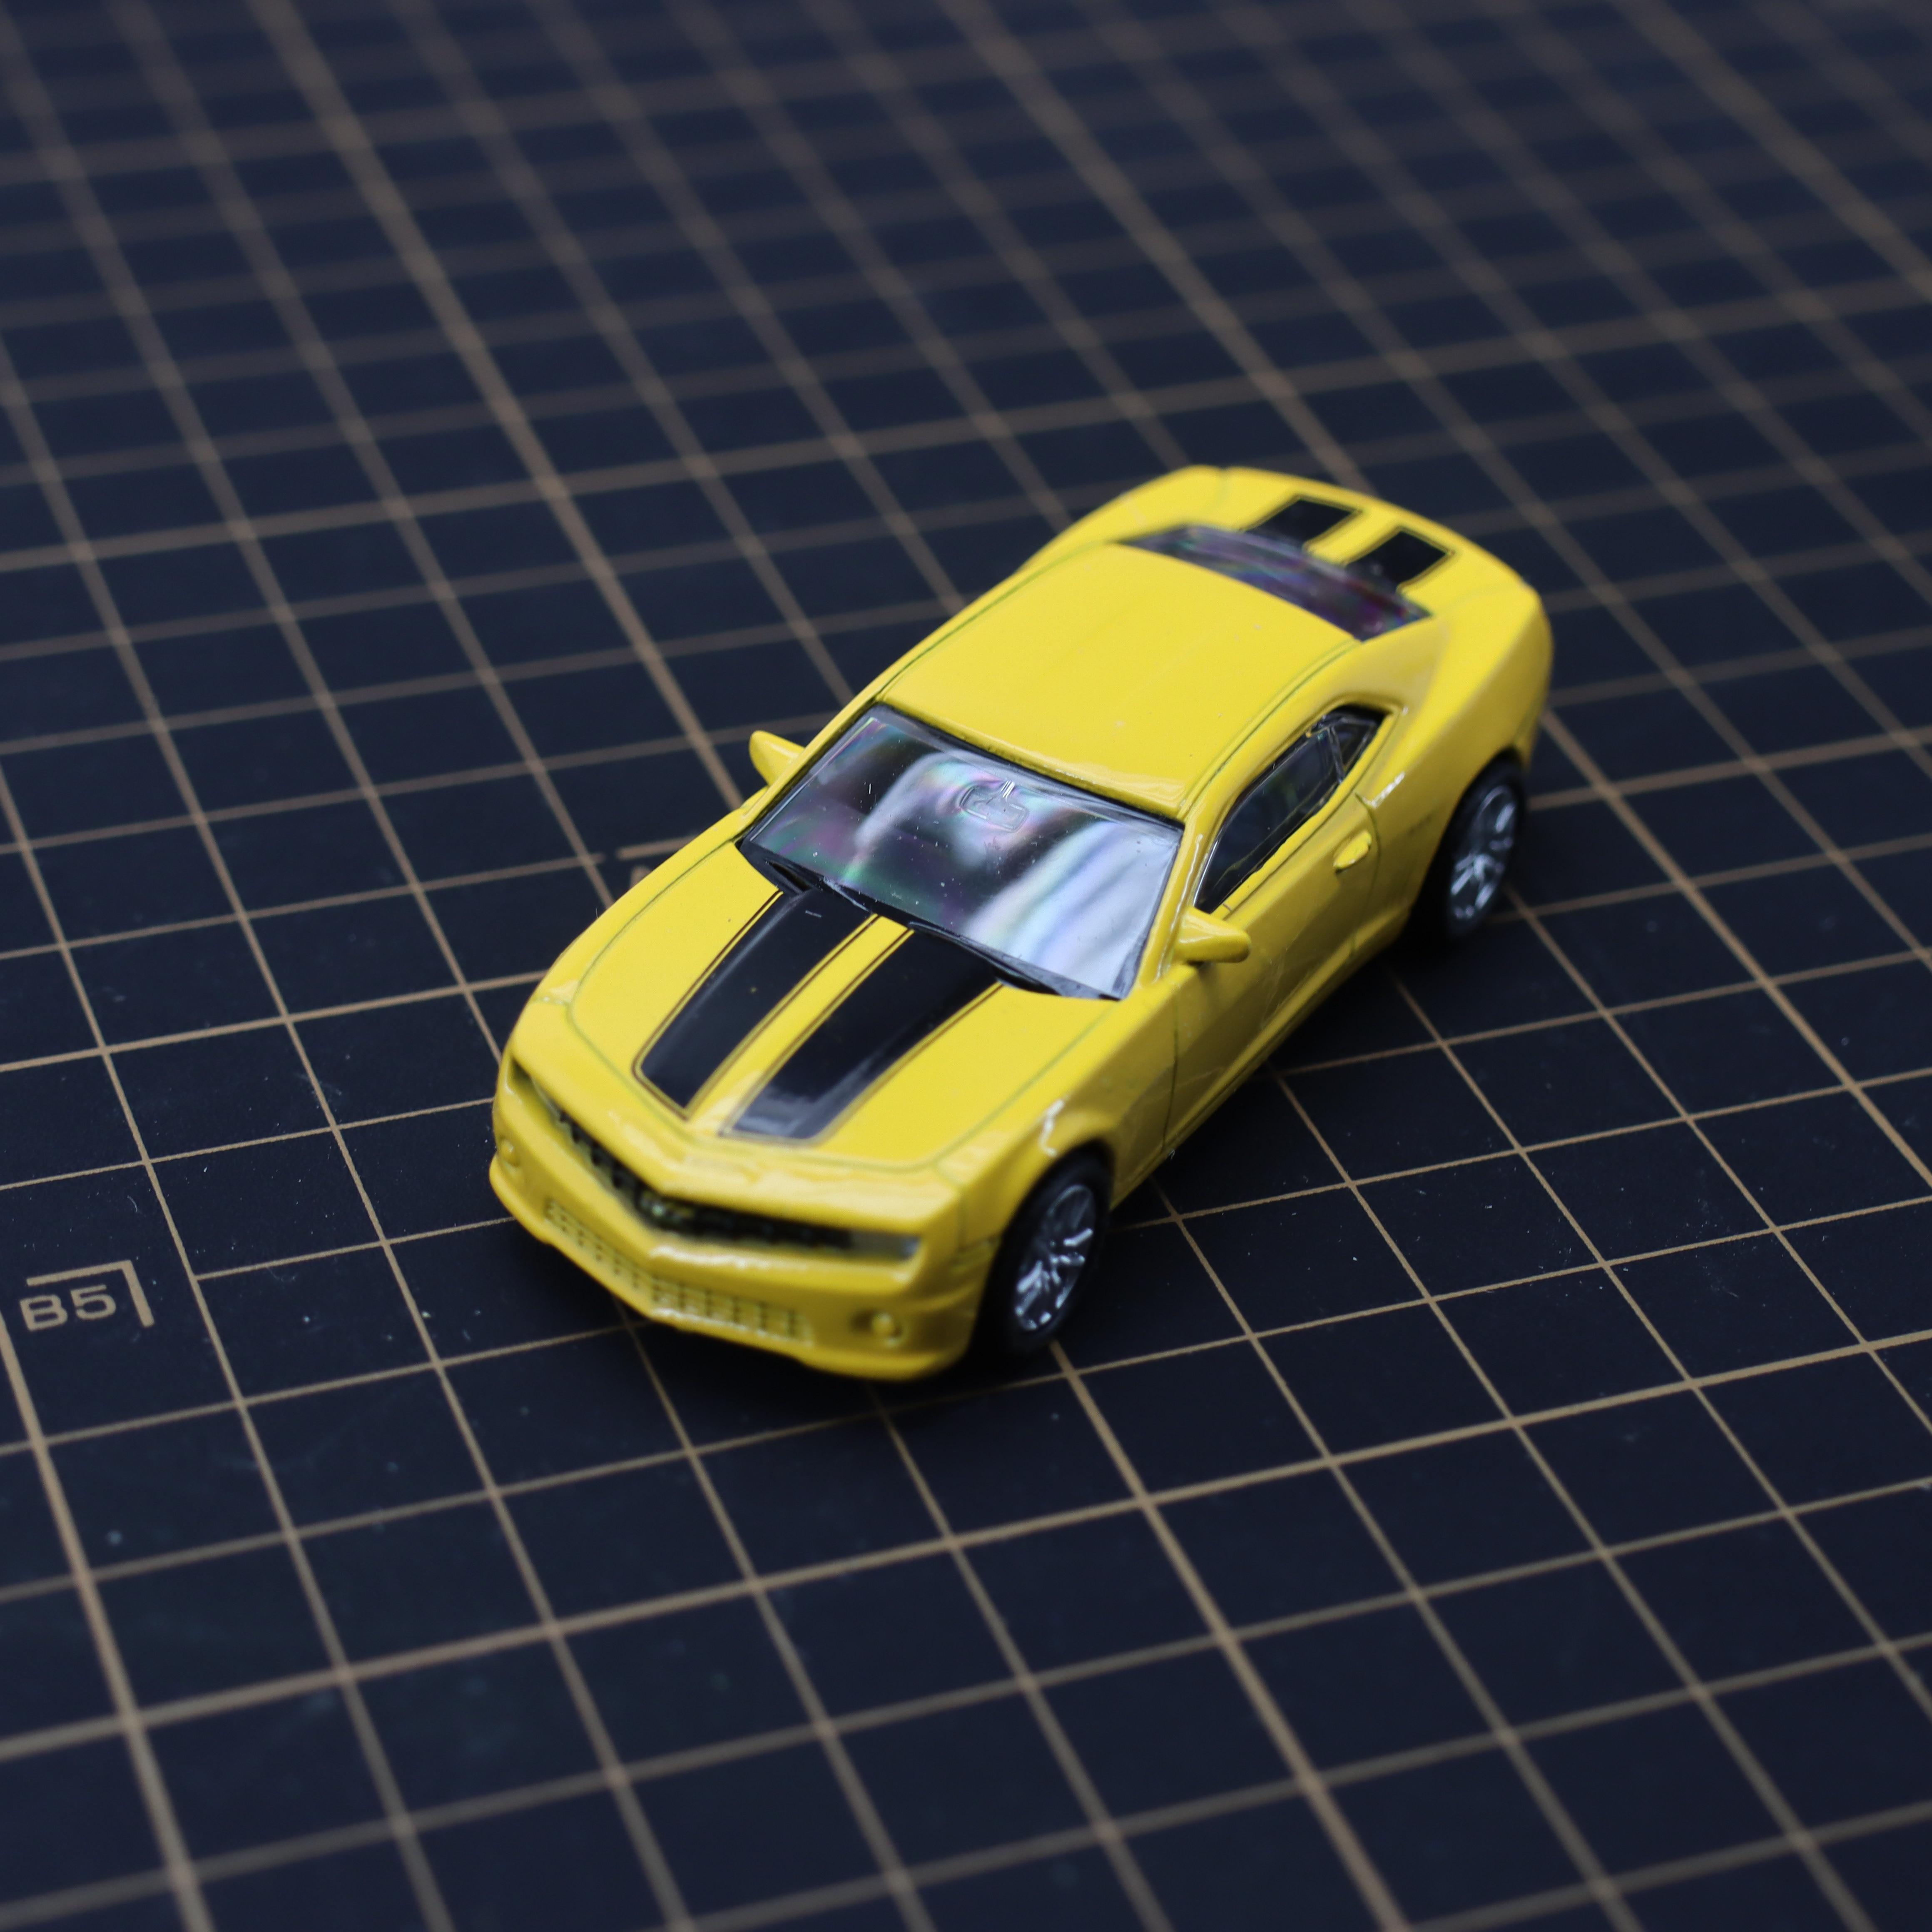 Diecast liga de brinquedo carro camaro 1/64 puxar-voltar-móvel